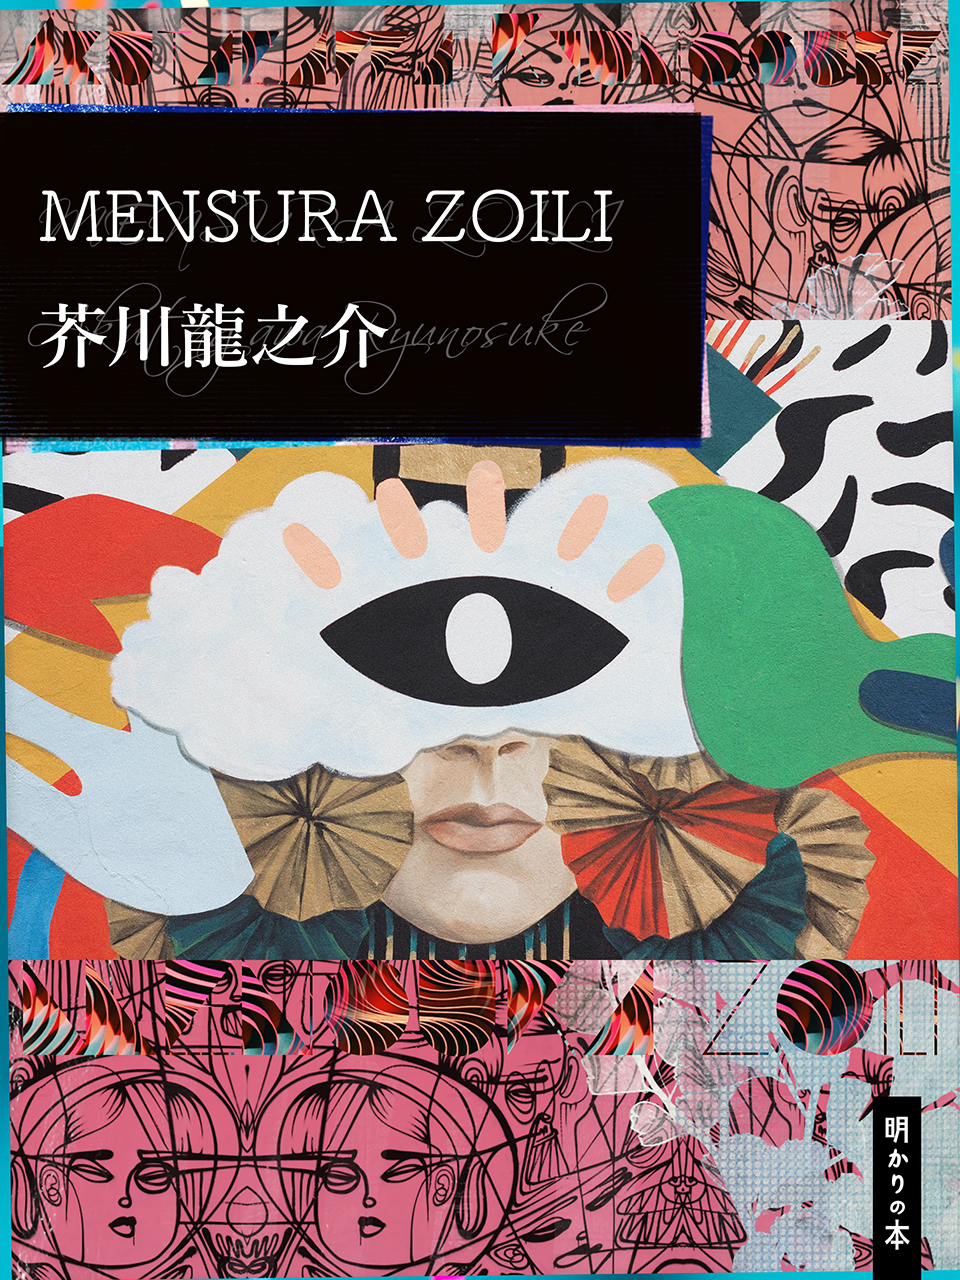 0000 - MENSURA ZOILI 芥川龍之介